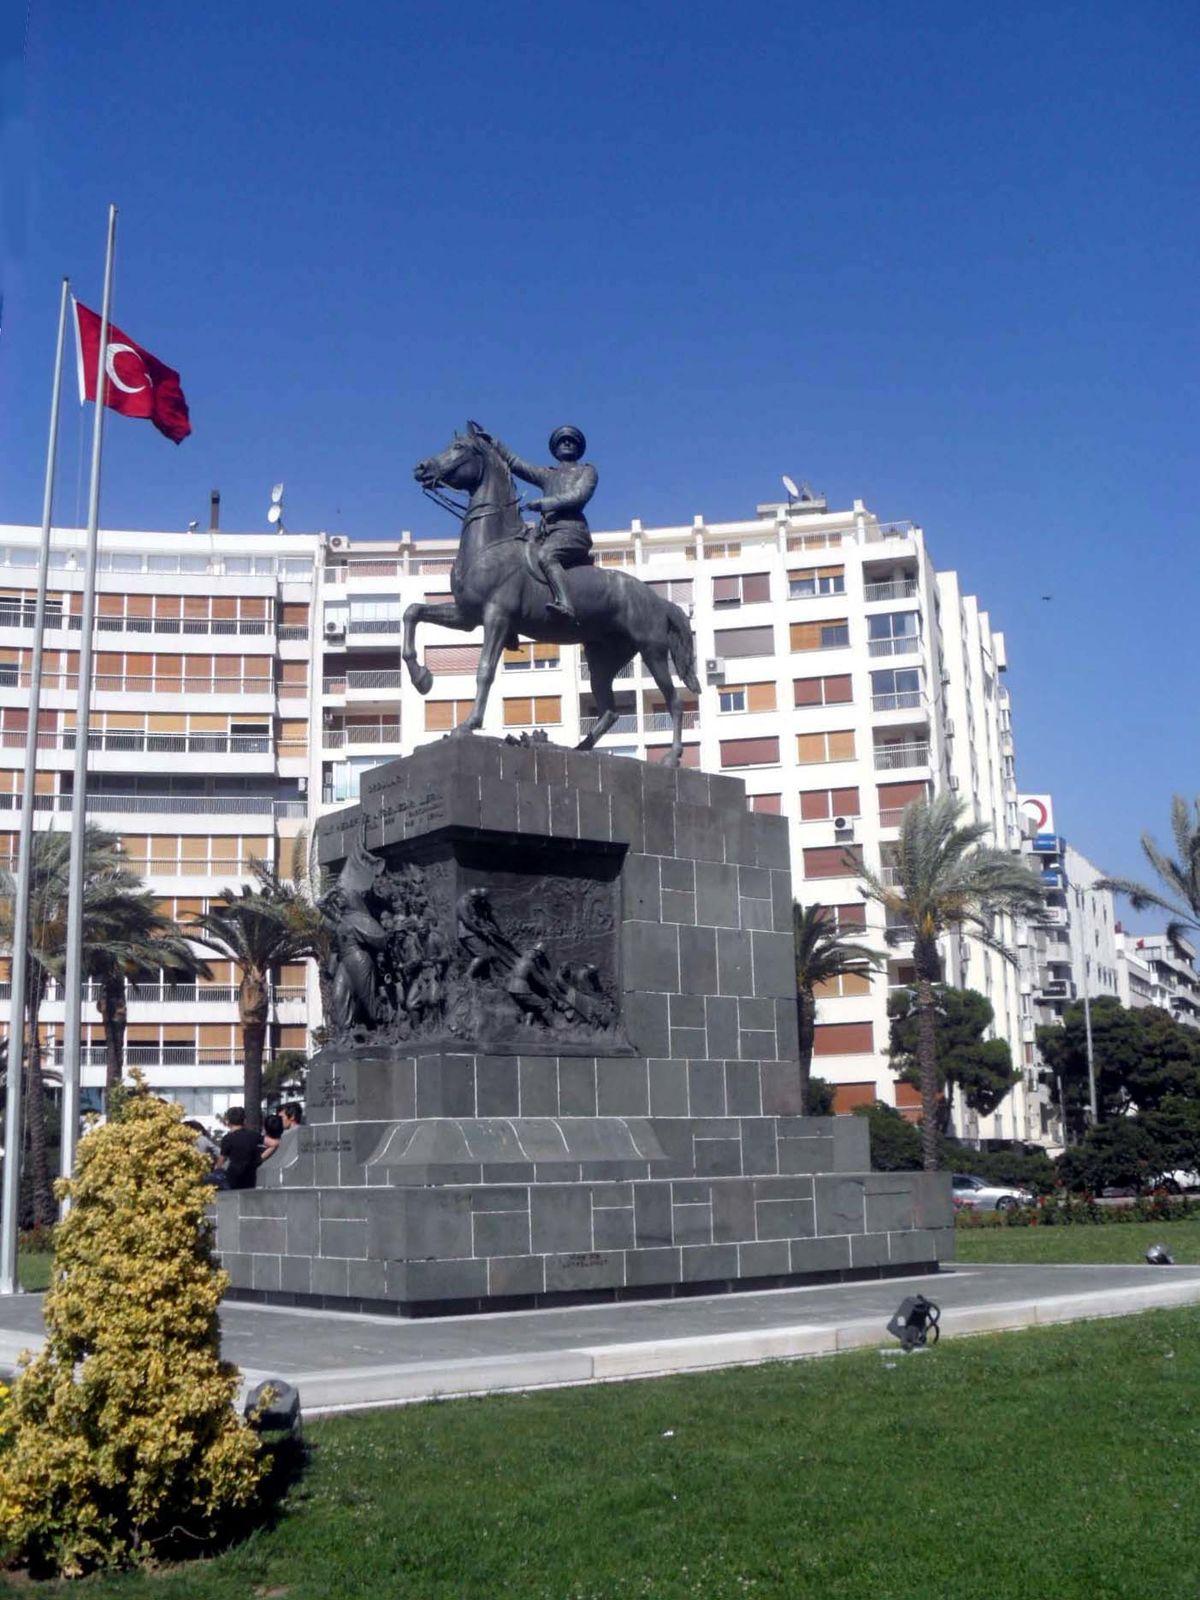 Izmir dating best places to meet girls in izmir & dating guide